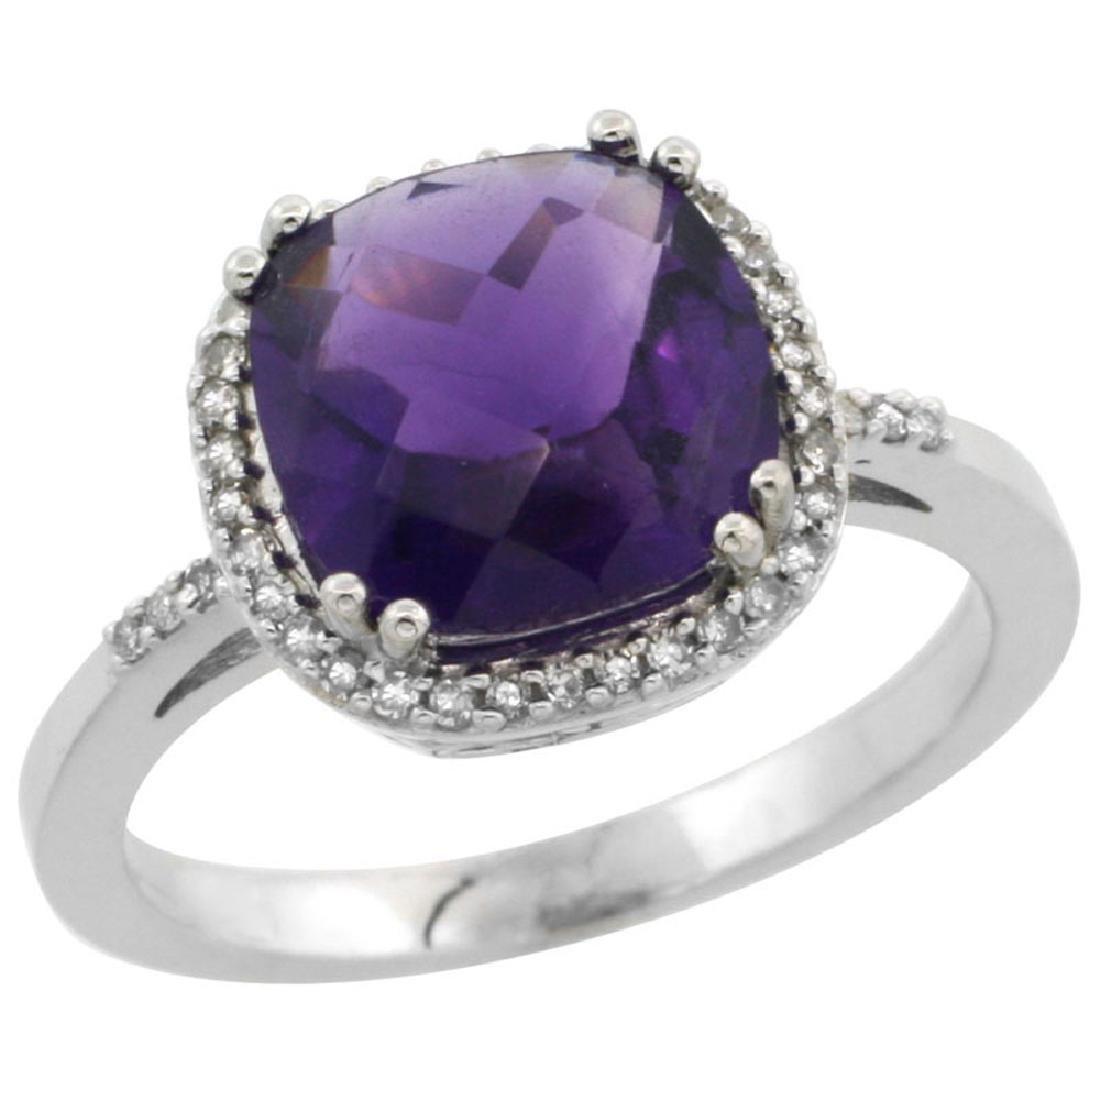 Natural 4.11 CTW Amethyst & Diamond Engagement Ring 14K